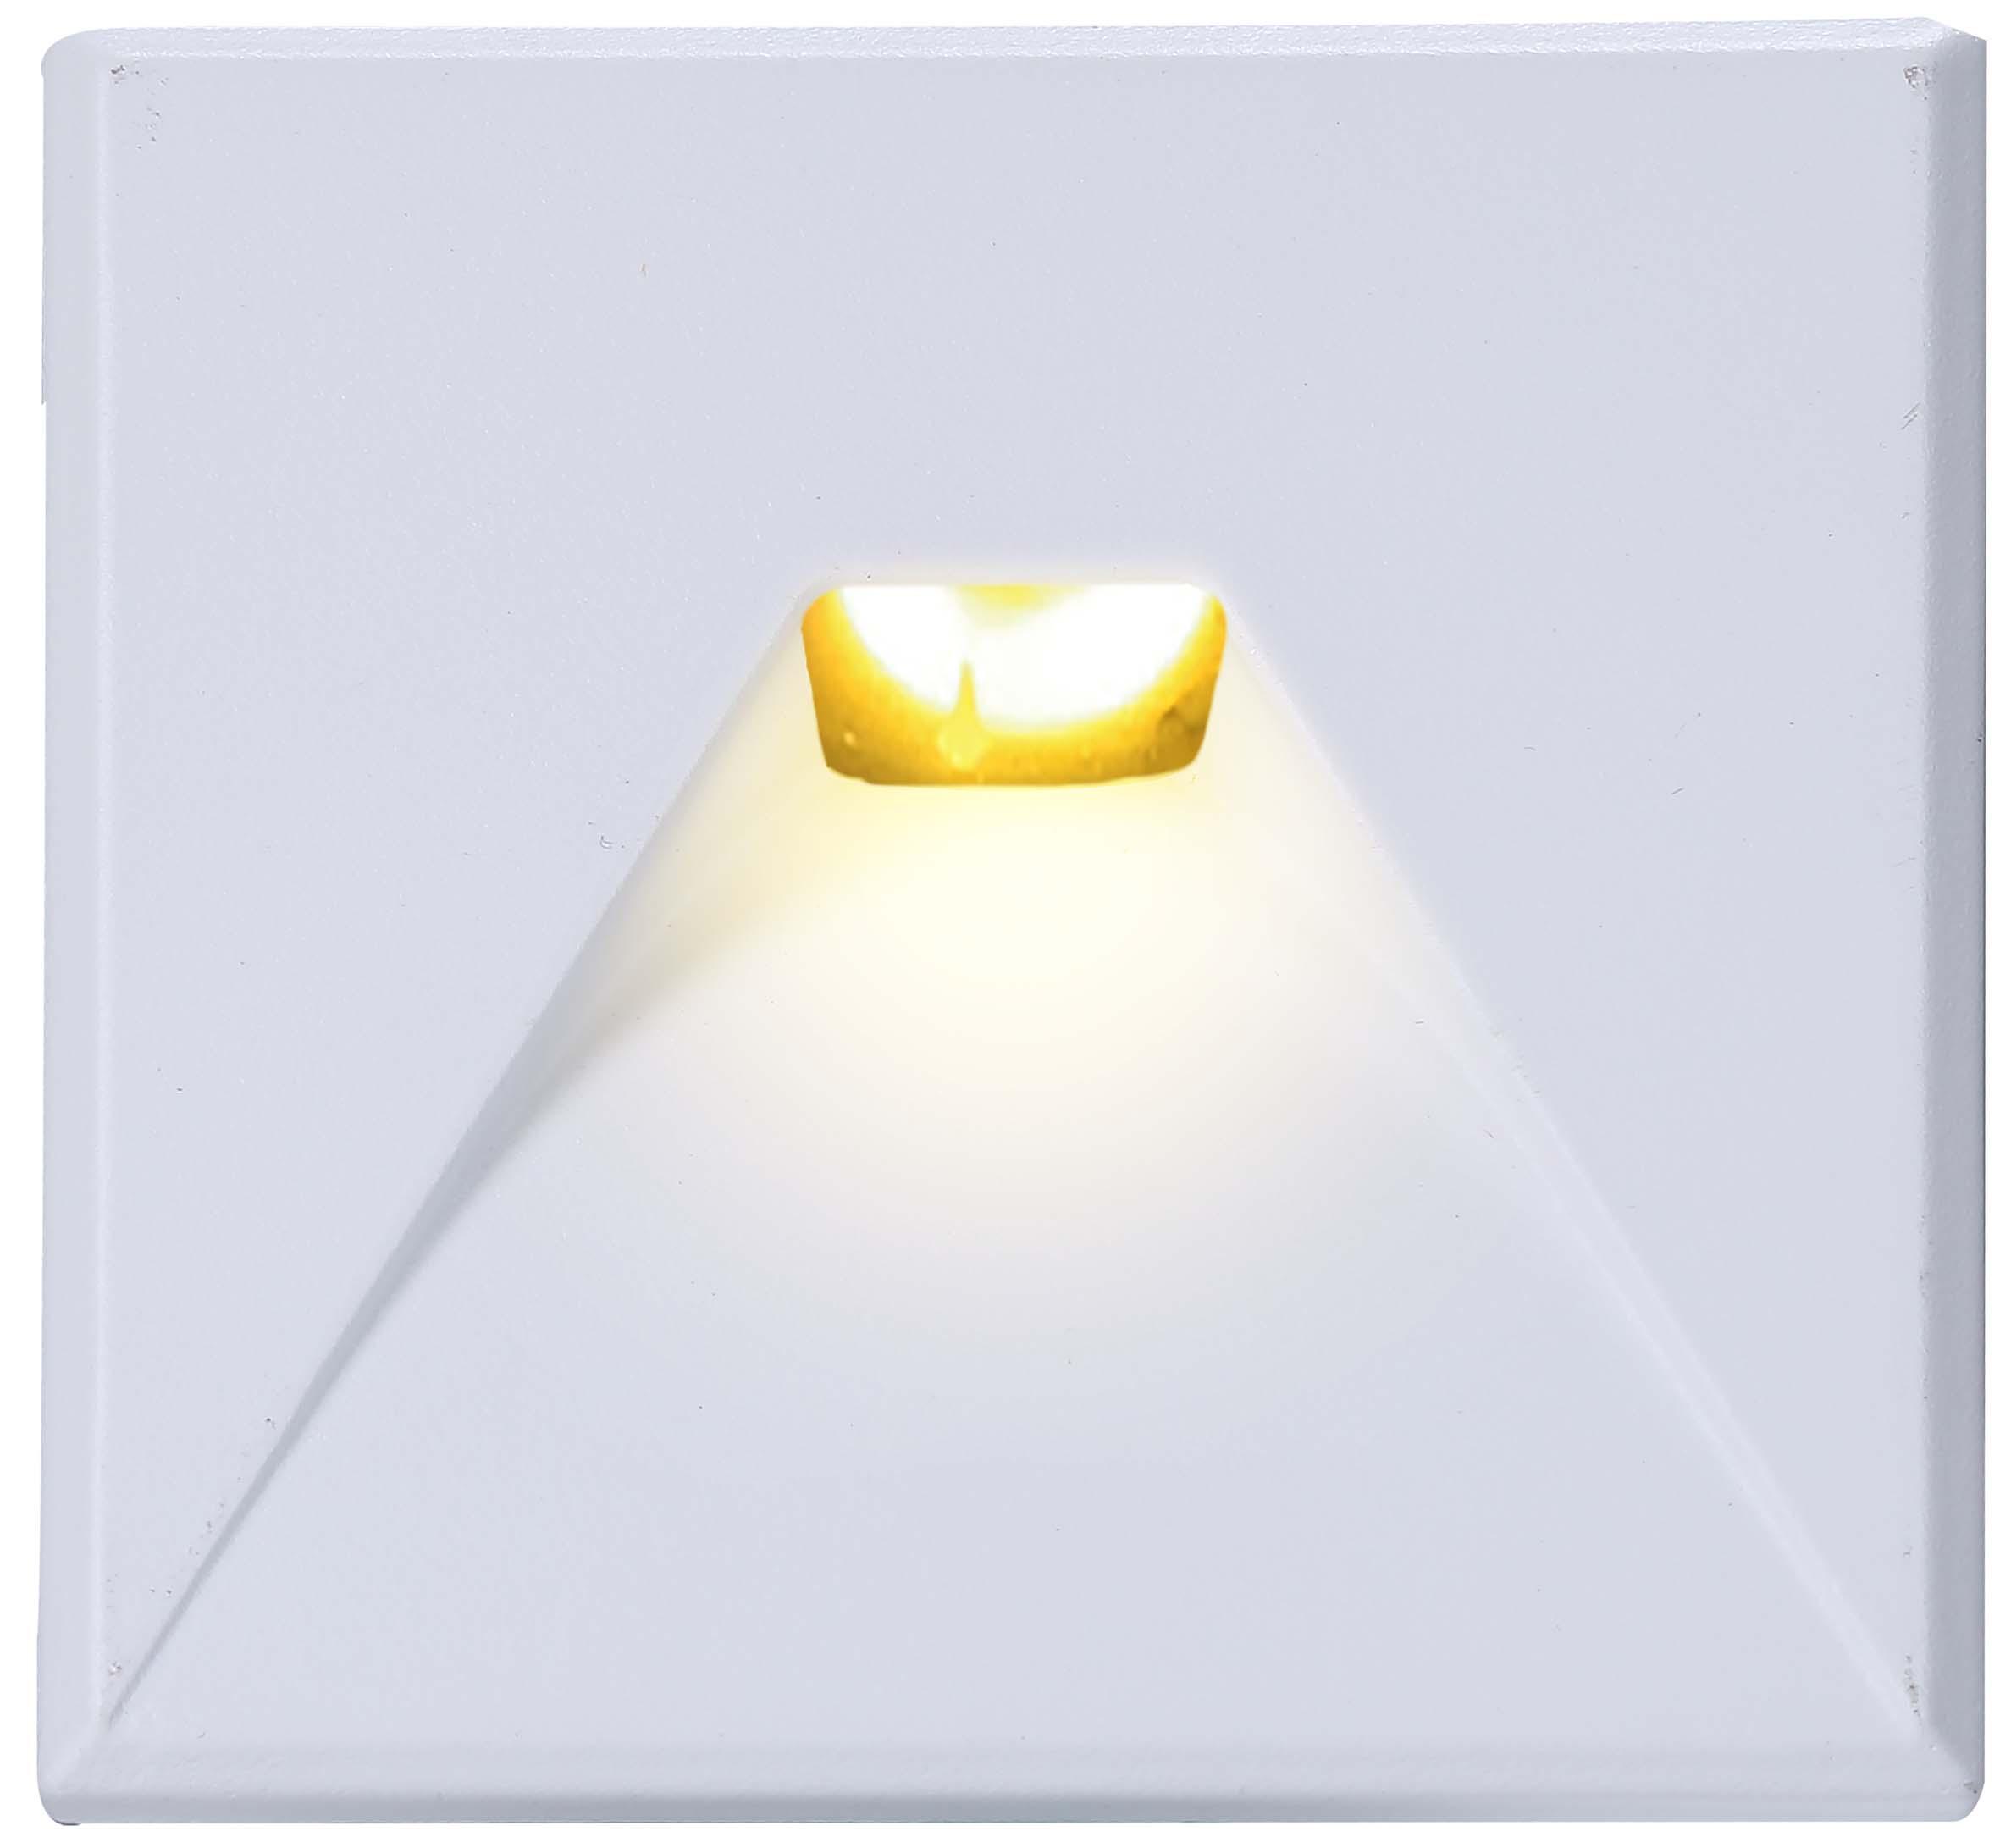 LHT1150_-_Steplight_-_Square_White_Fan_%28light_ON%29